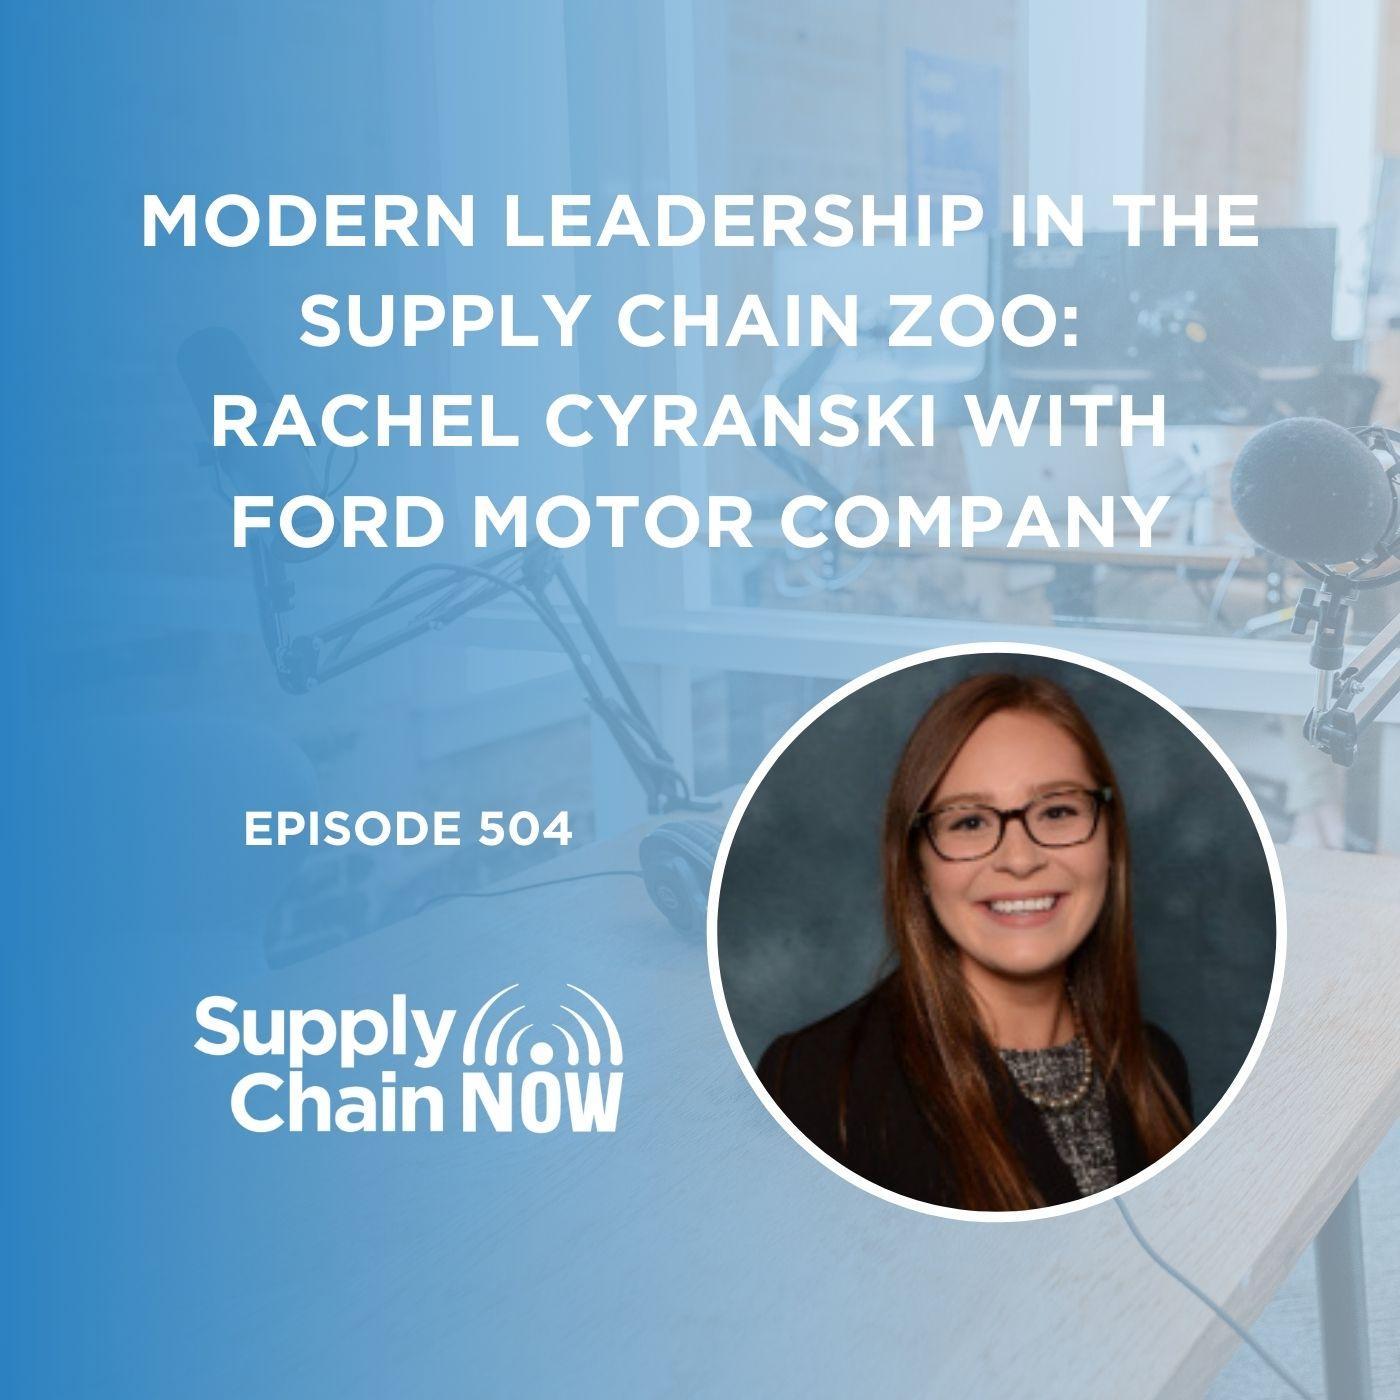 Modern Leadership in the Supply Chain Zoo: Rachel Cyranski with Ford Motor Company